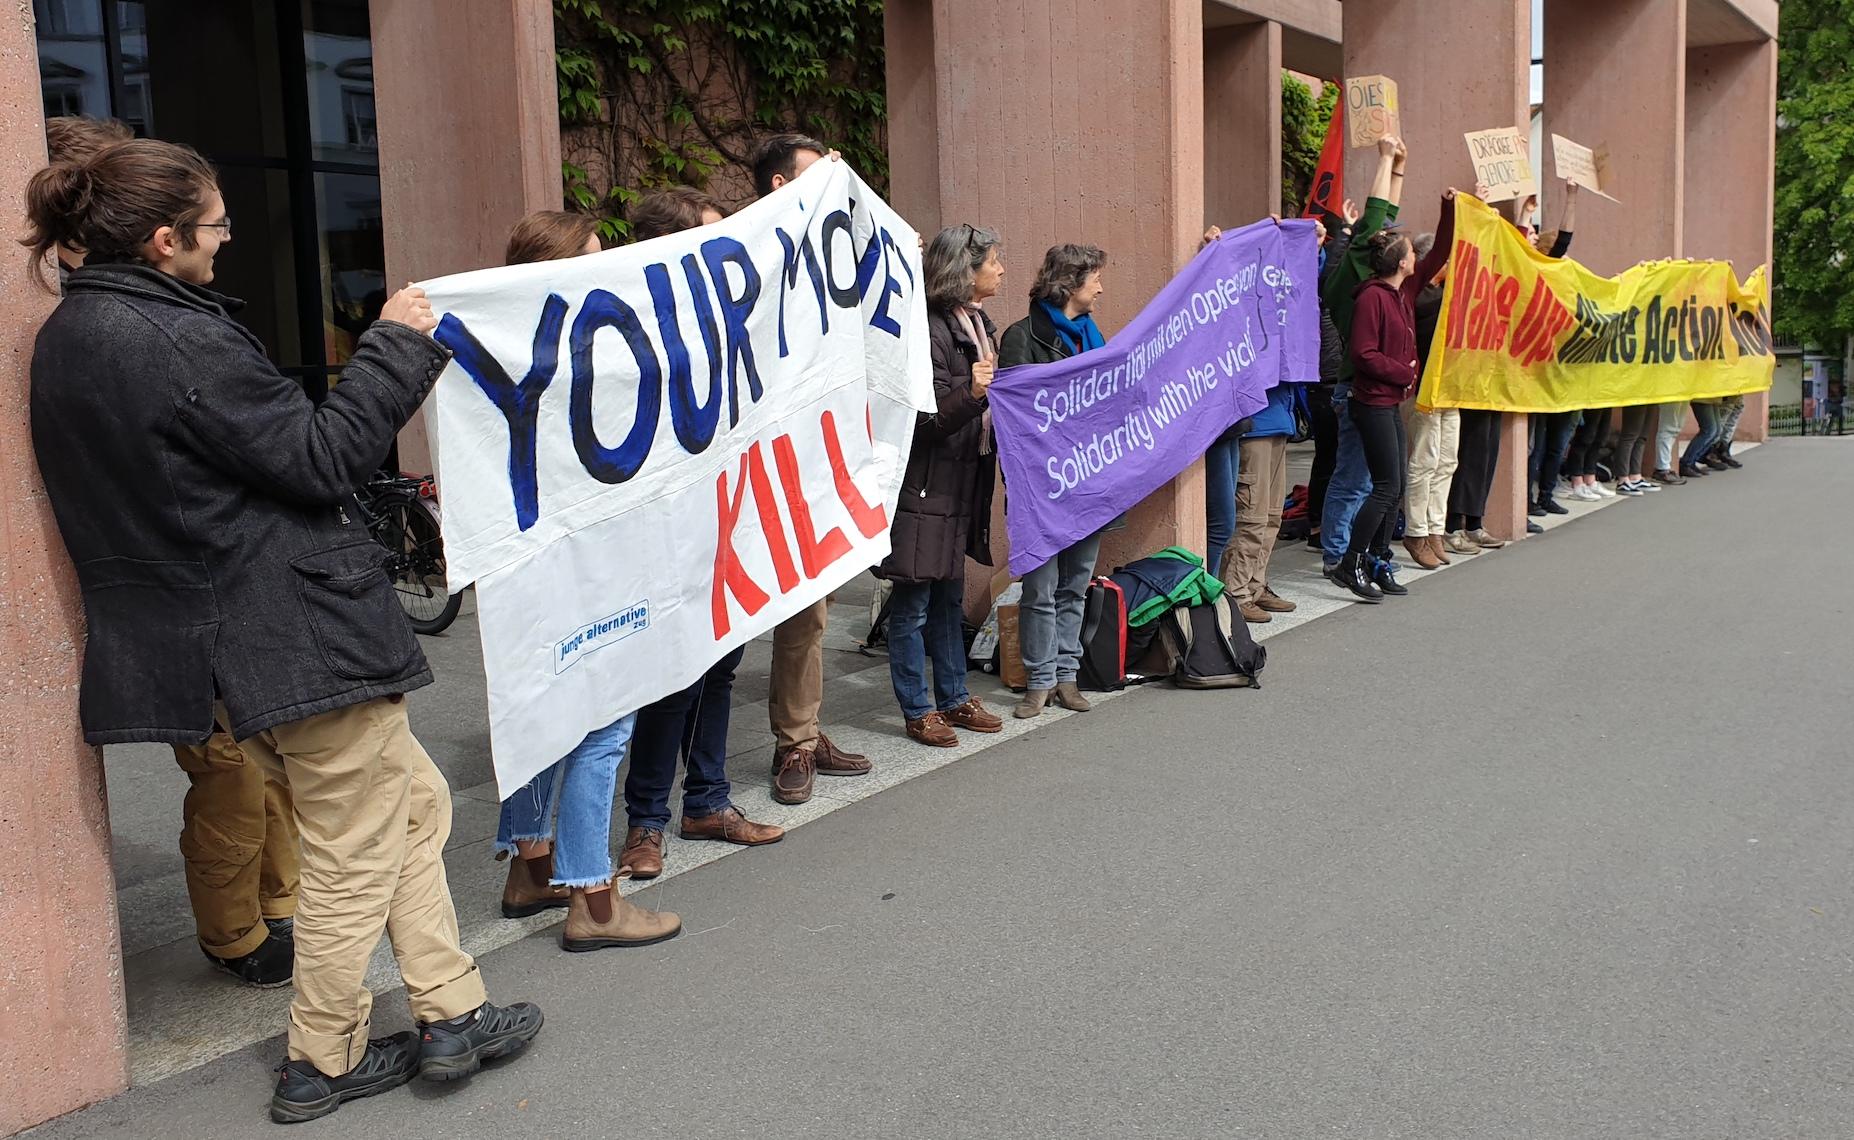 Klimaaktivisten demonstireren vor dem Casino Zug gegen Glencore.